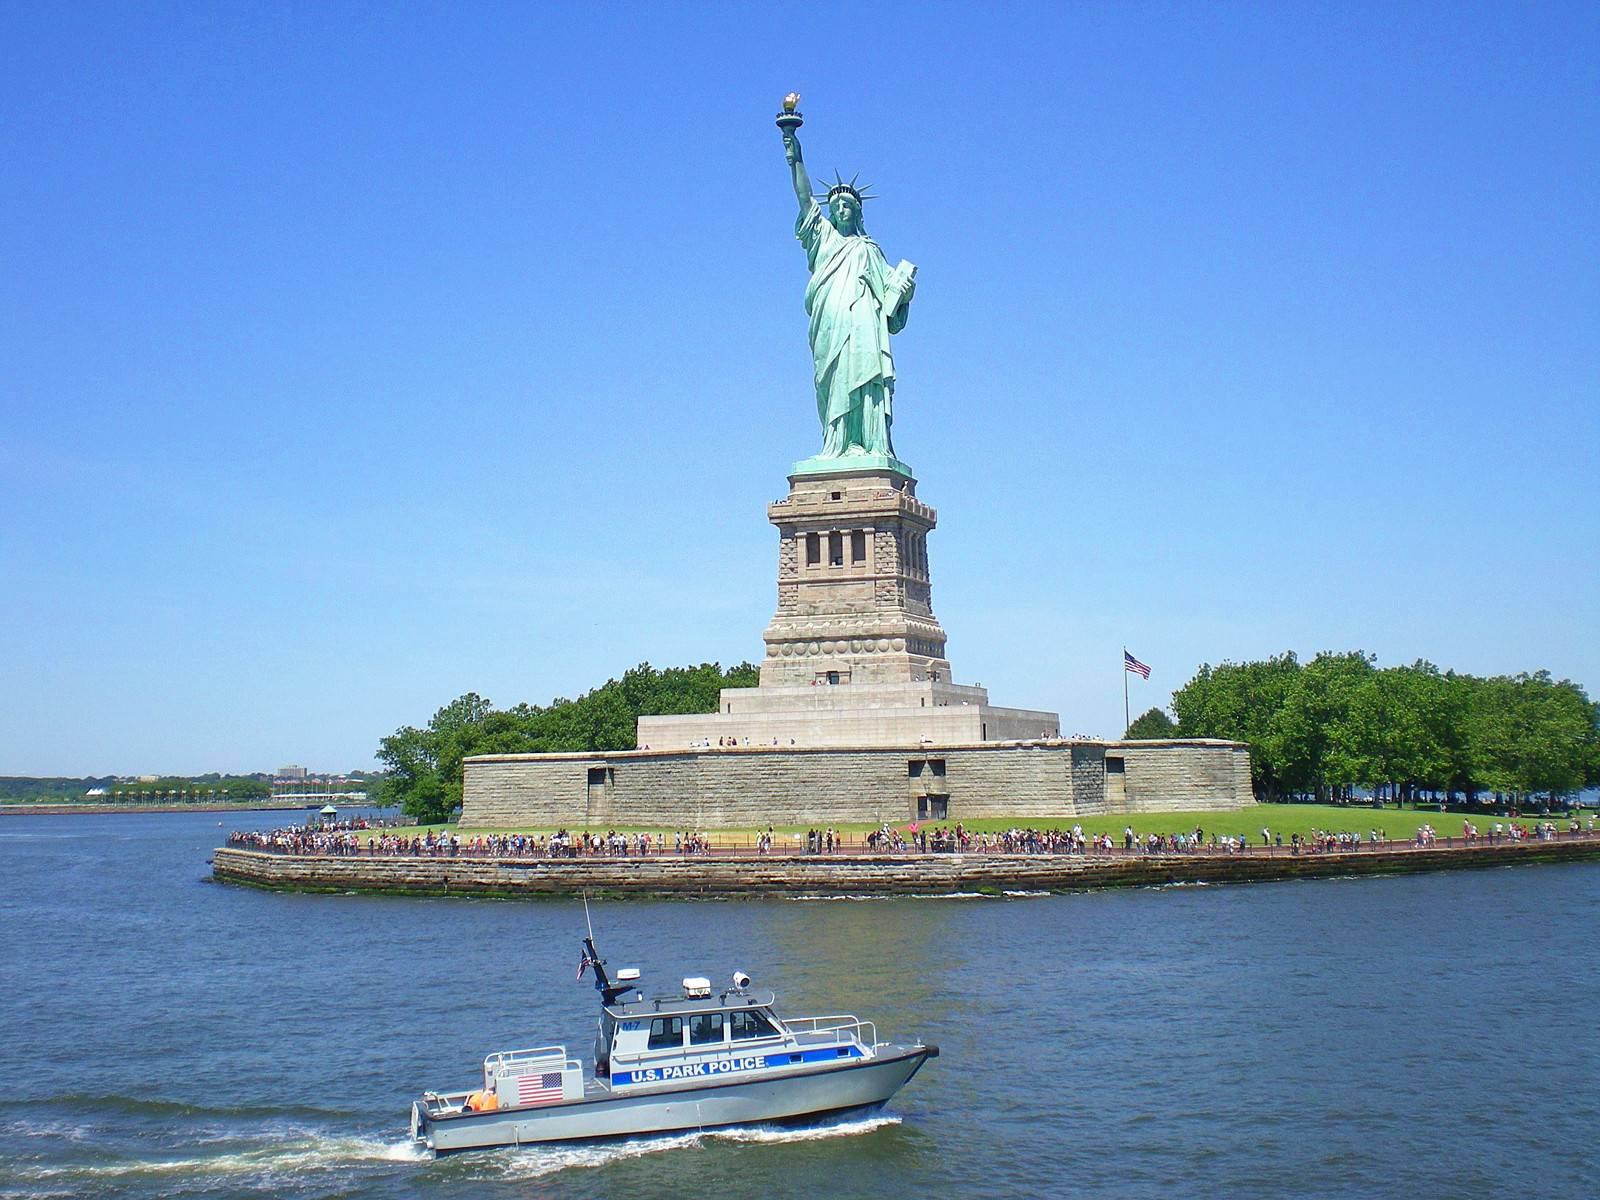 9-Day East Coast In-Depth Tour: Niagara Falls, NYC, DC, Boston, Philadelphia, Rhode Island